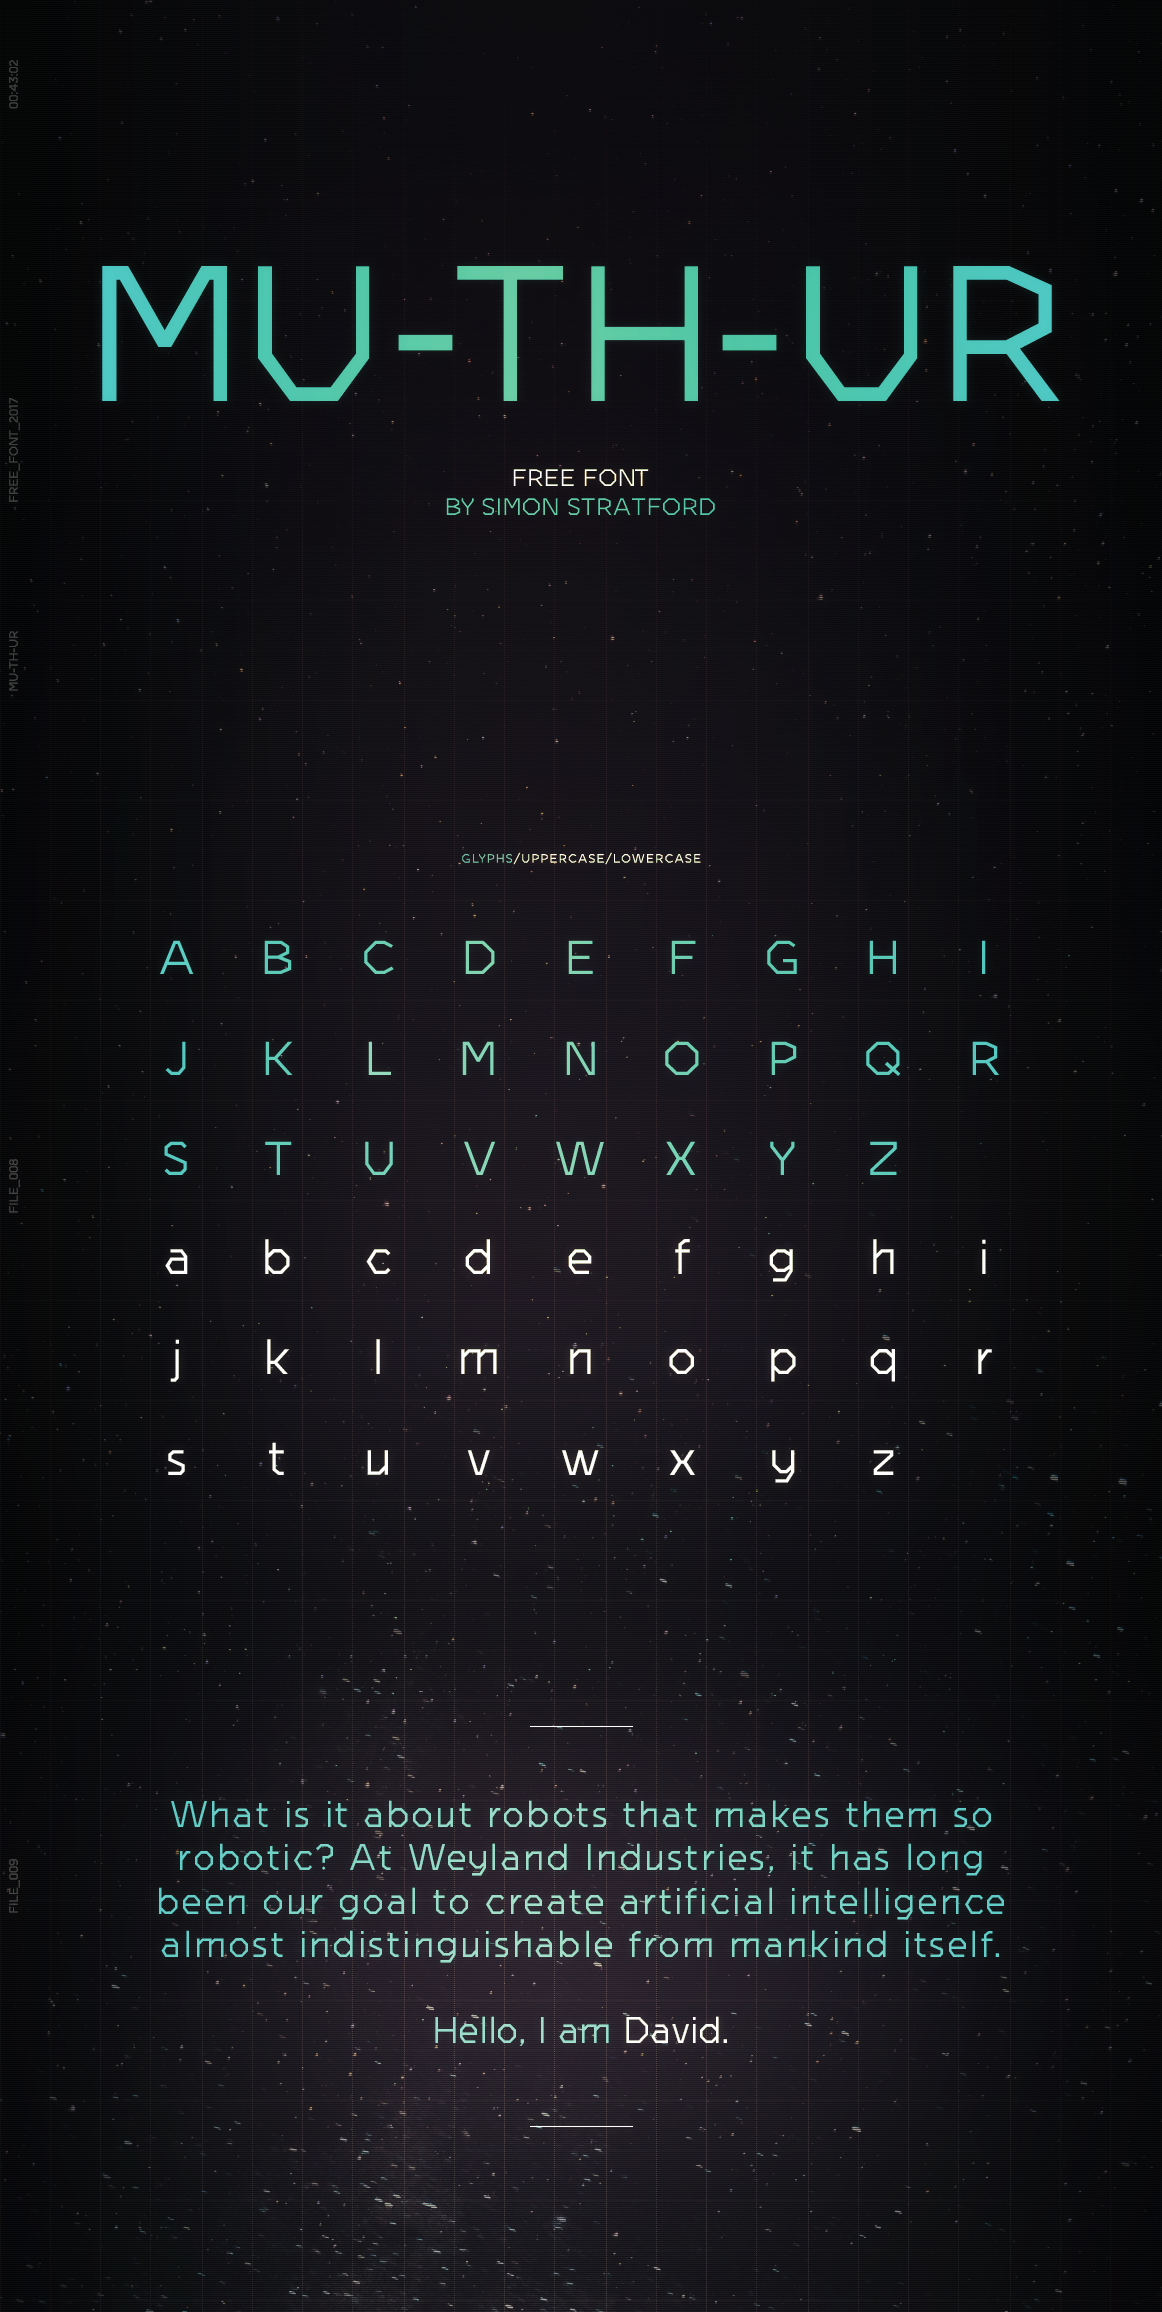 mu-th-ur font Typeface Free font free type typeface design muthur font Simon stratford itsmesimon